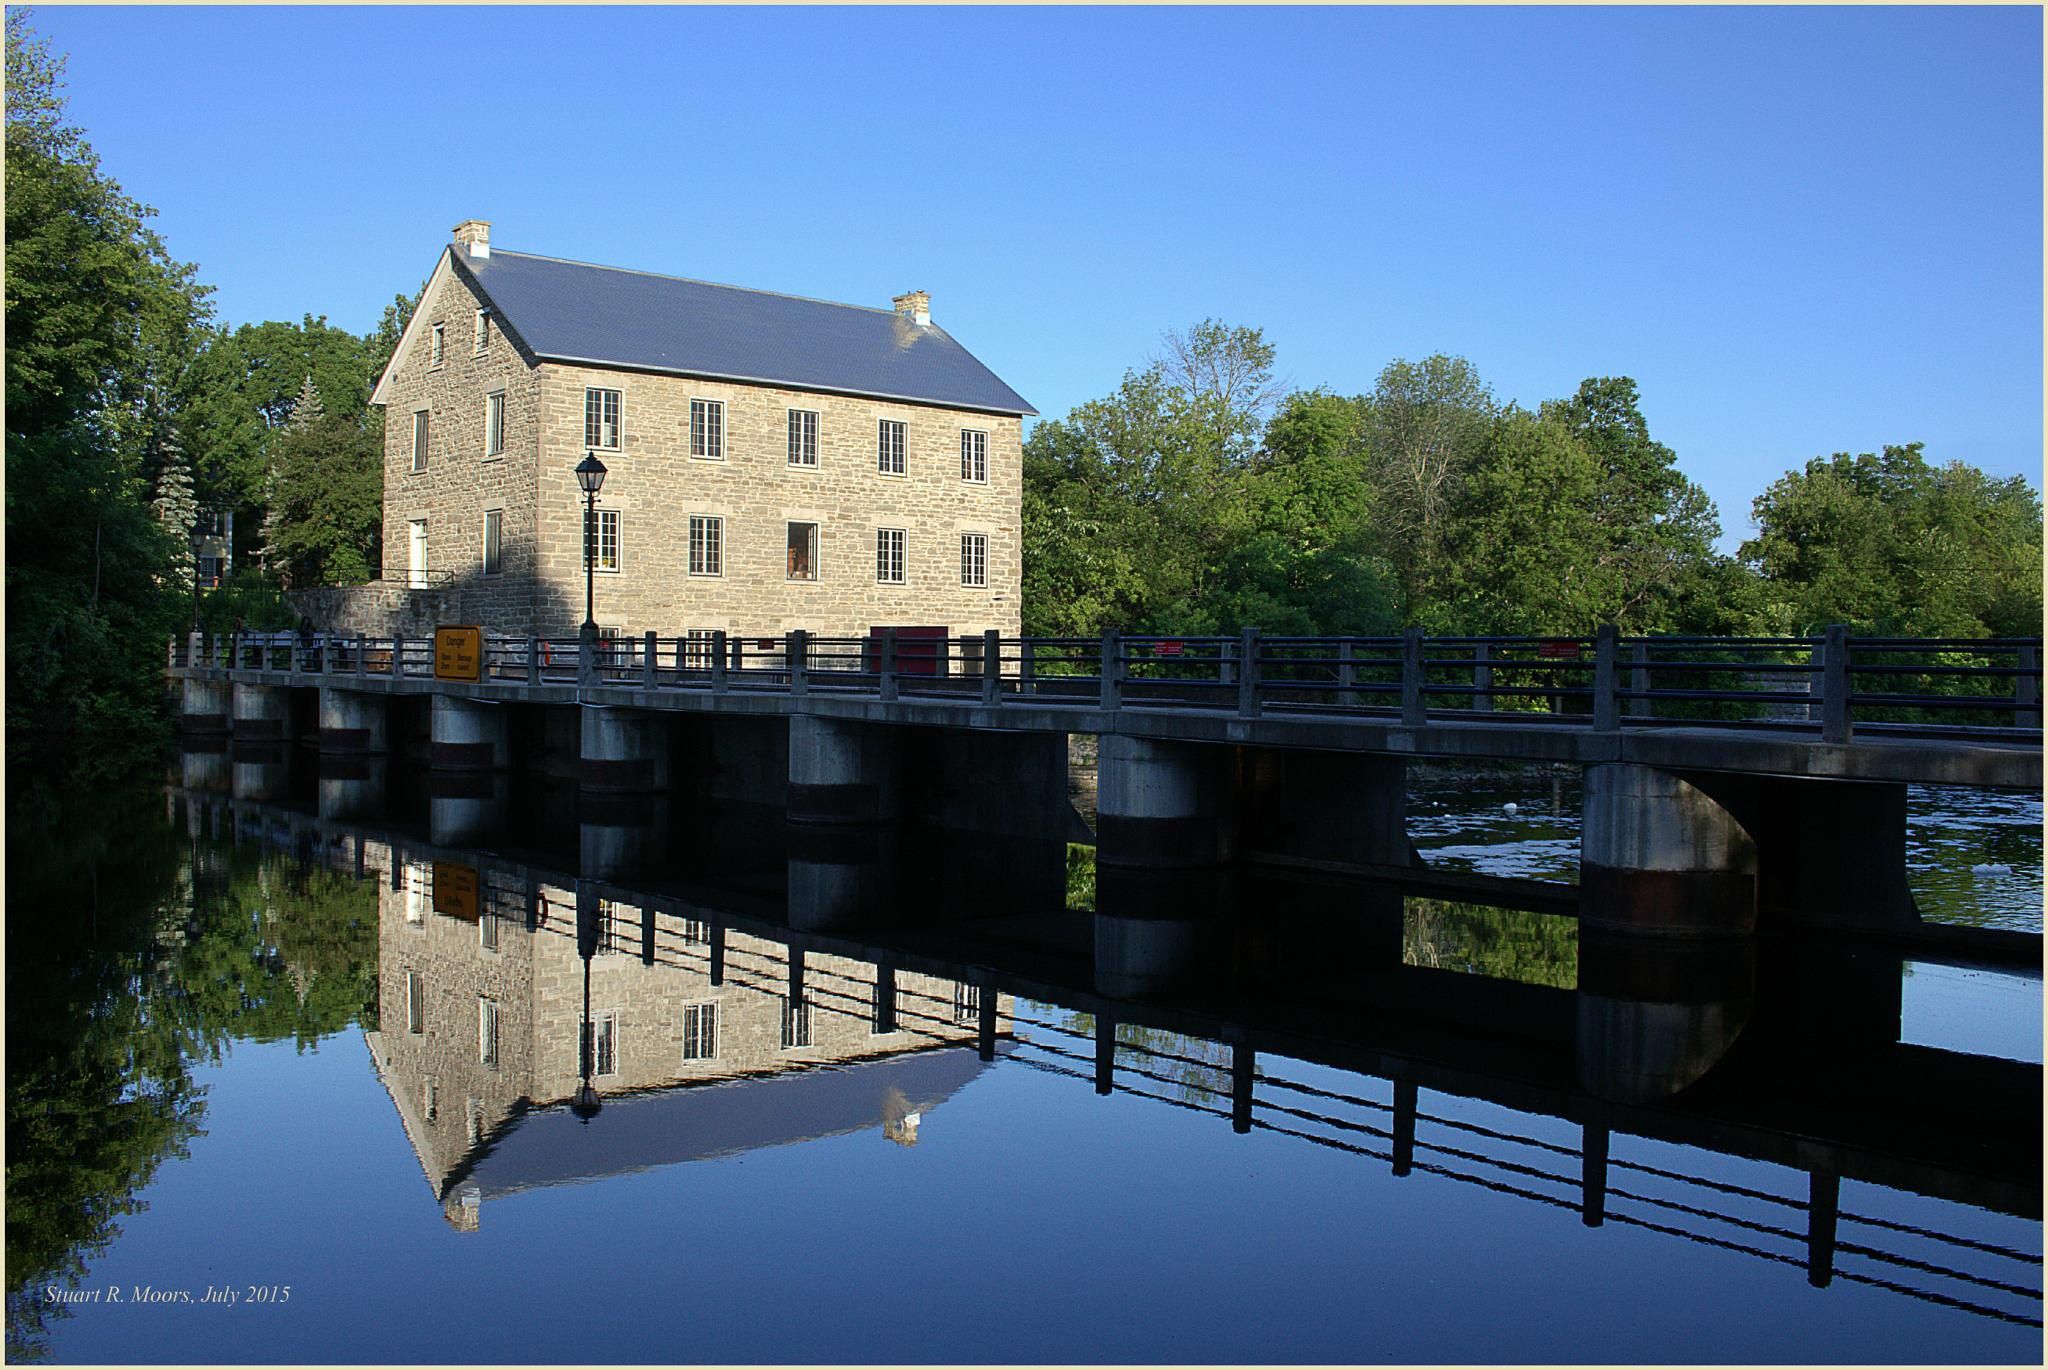 Watson's Mill by sakarasailor